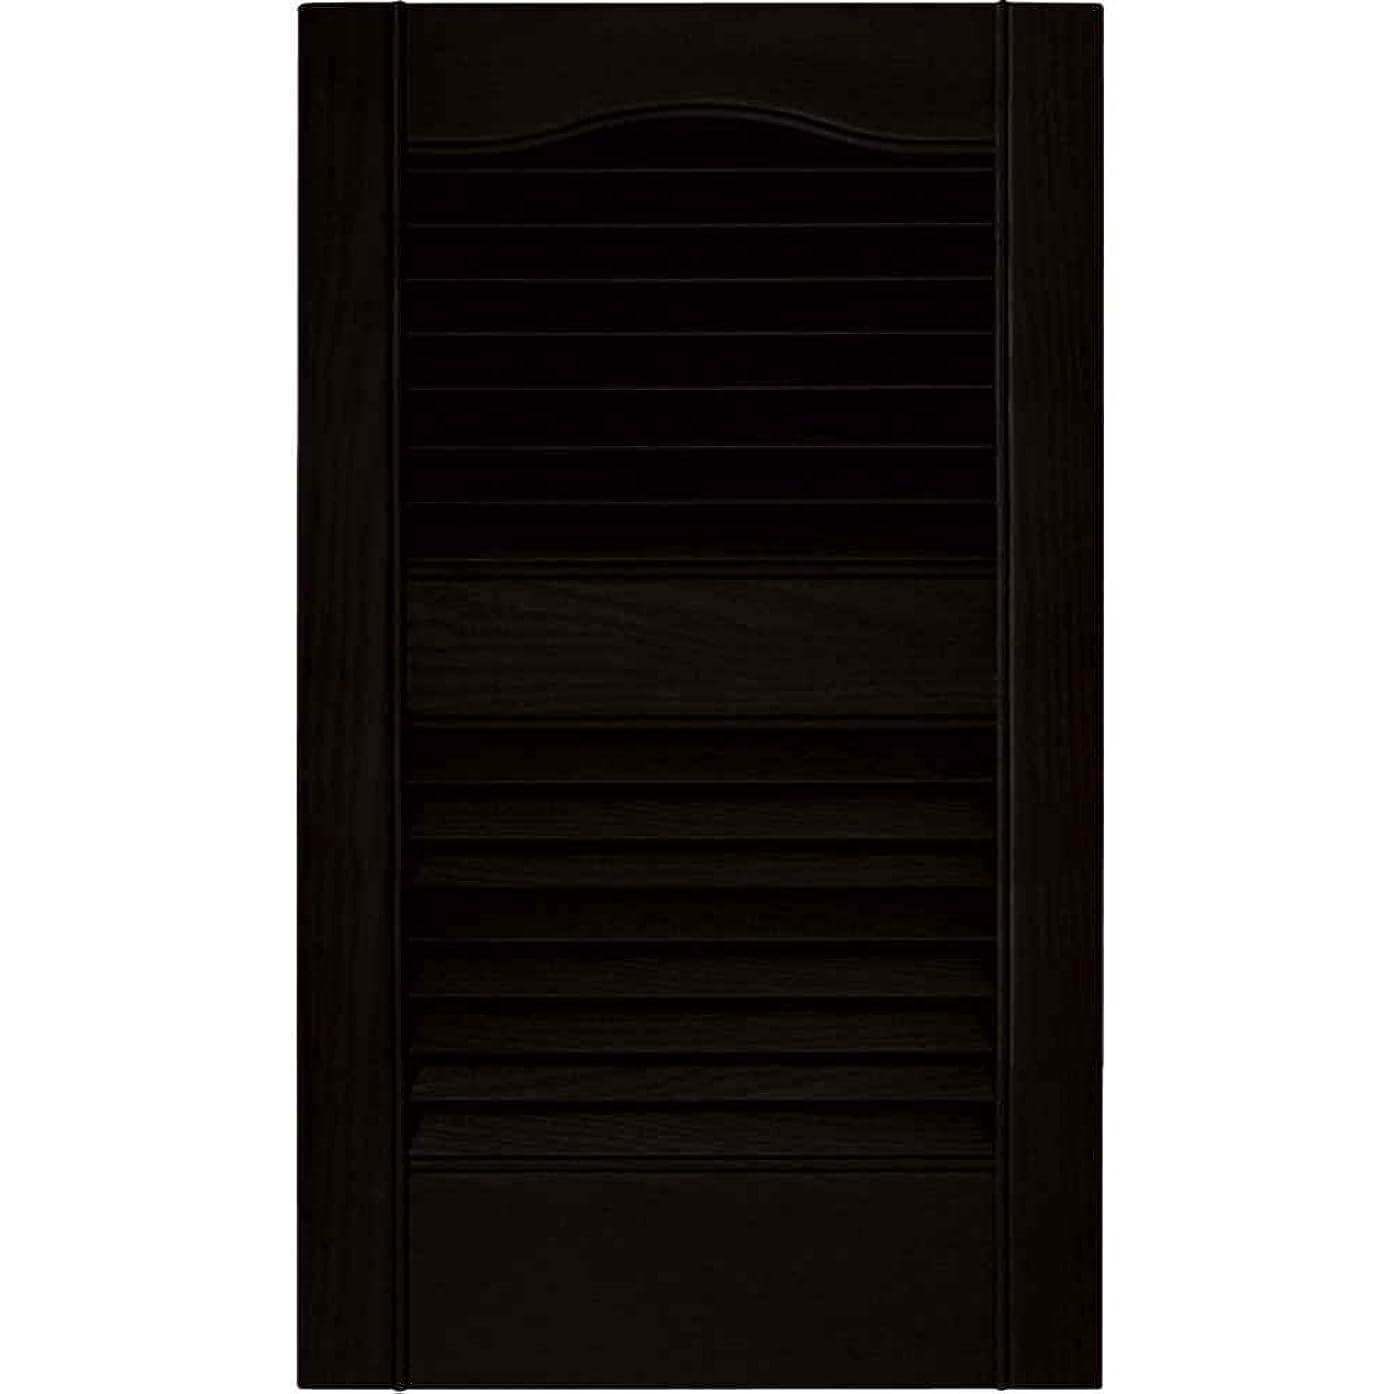 PCI Enterprises 12 in. Vinyl Louvered Shutters in Black - Set of 2 (12 in. W x 1 in. D x 52 in. H (4.76 lbs.))